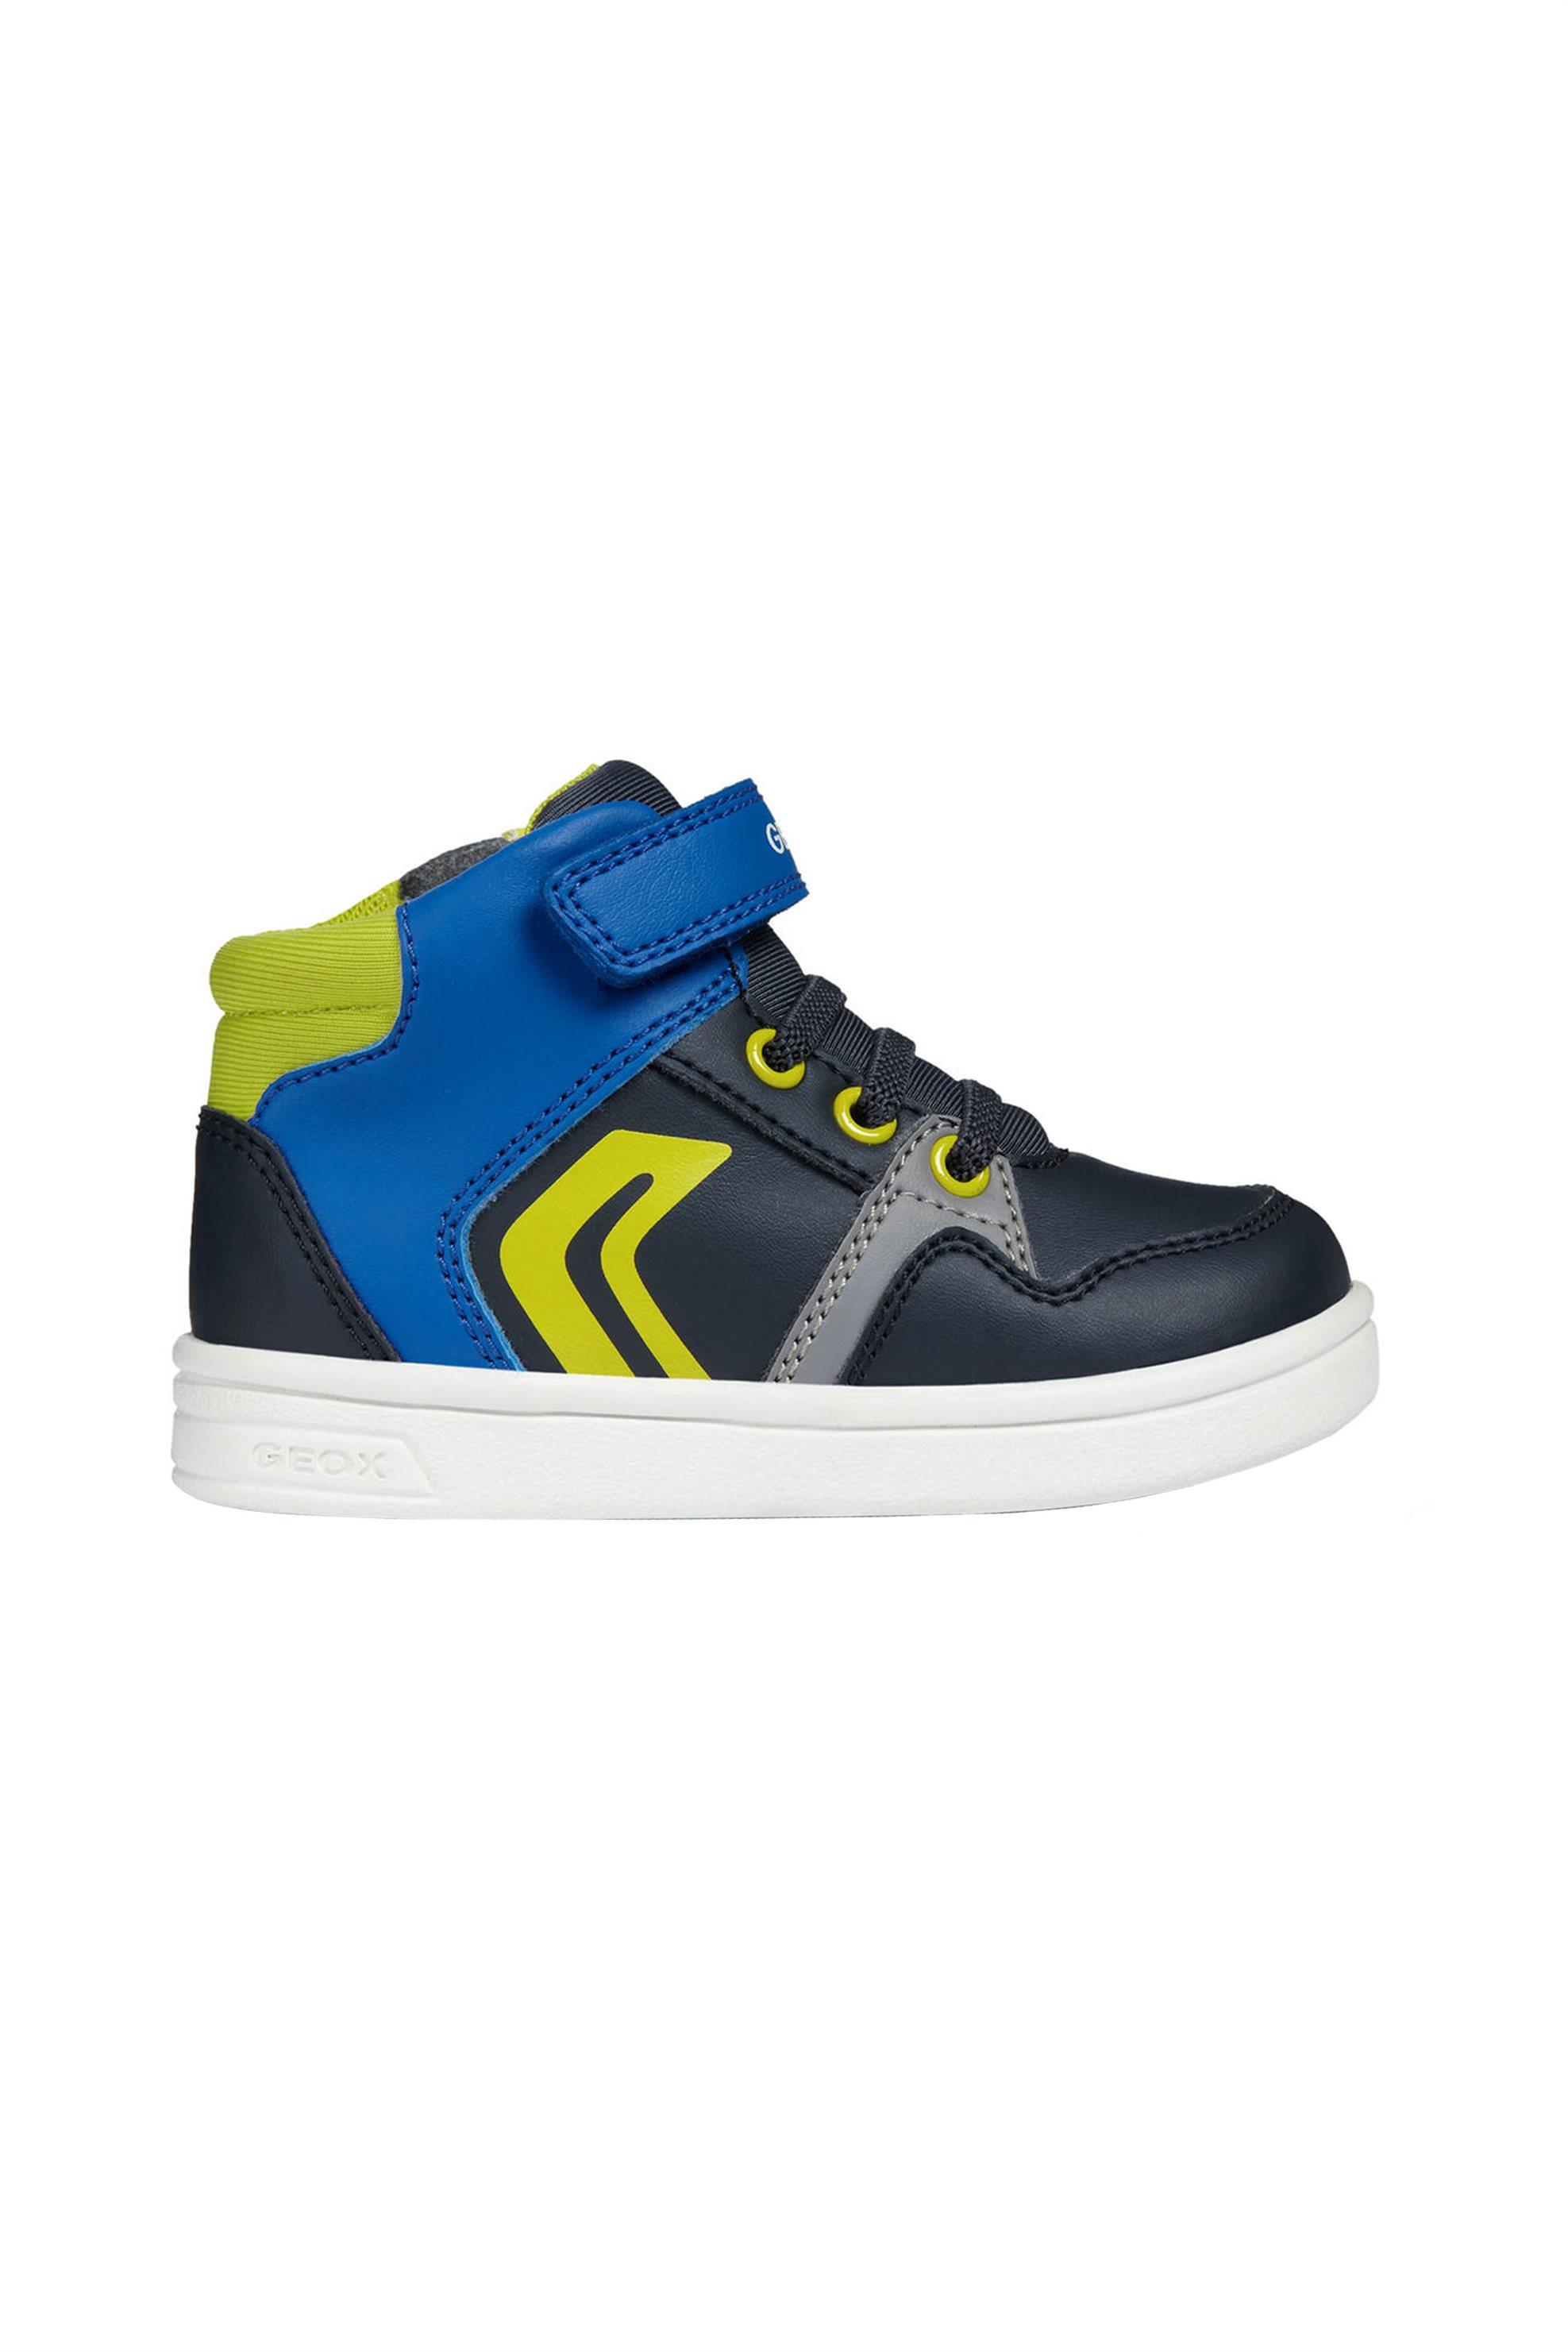 81fb76abc27 ... Geox παιδικα sneakers μποτάκια Baby Djrock Boy – B842CA – Μπλε